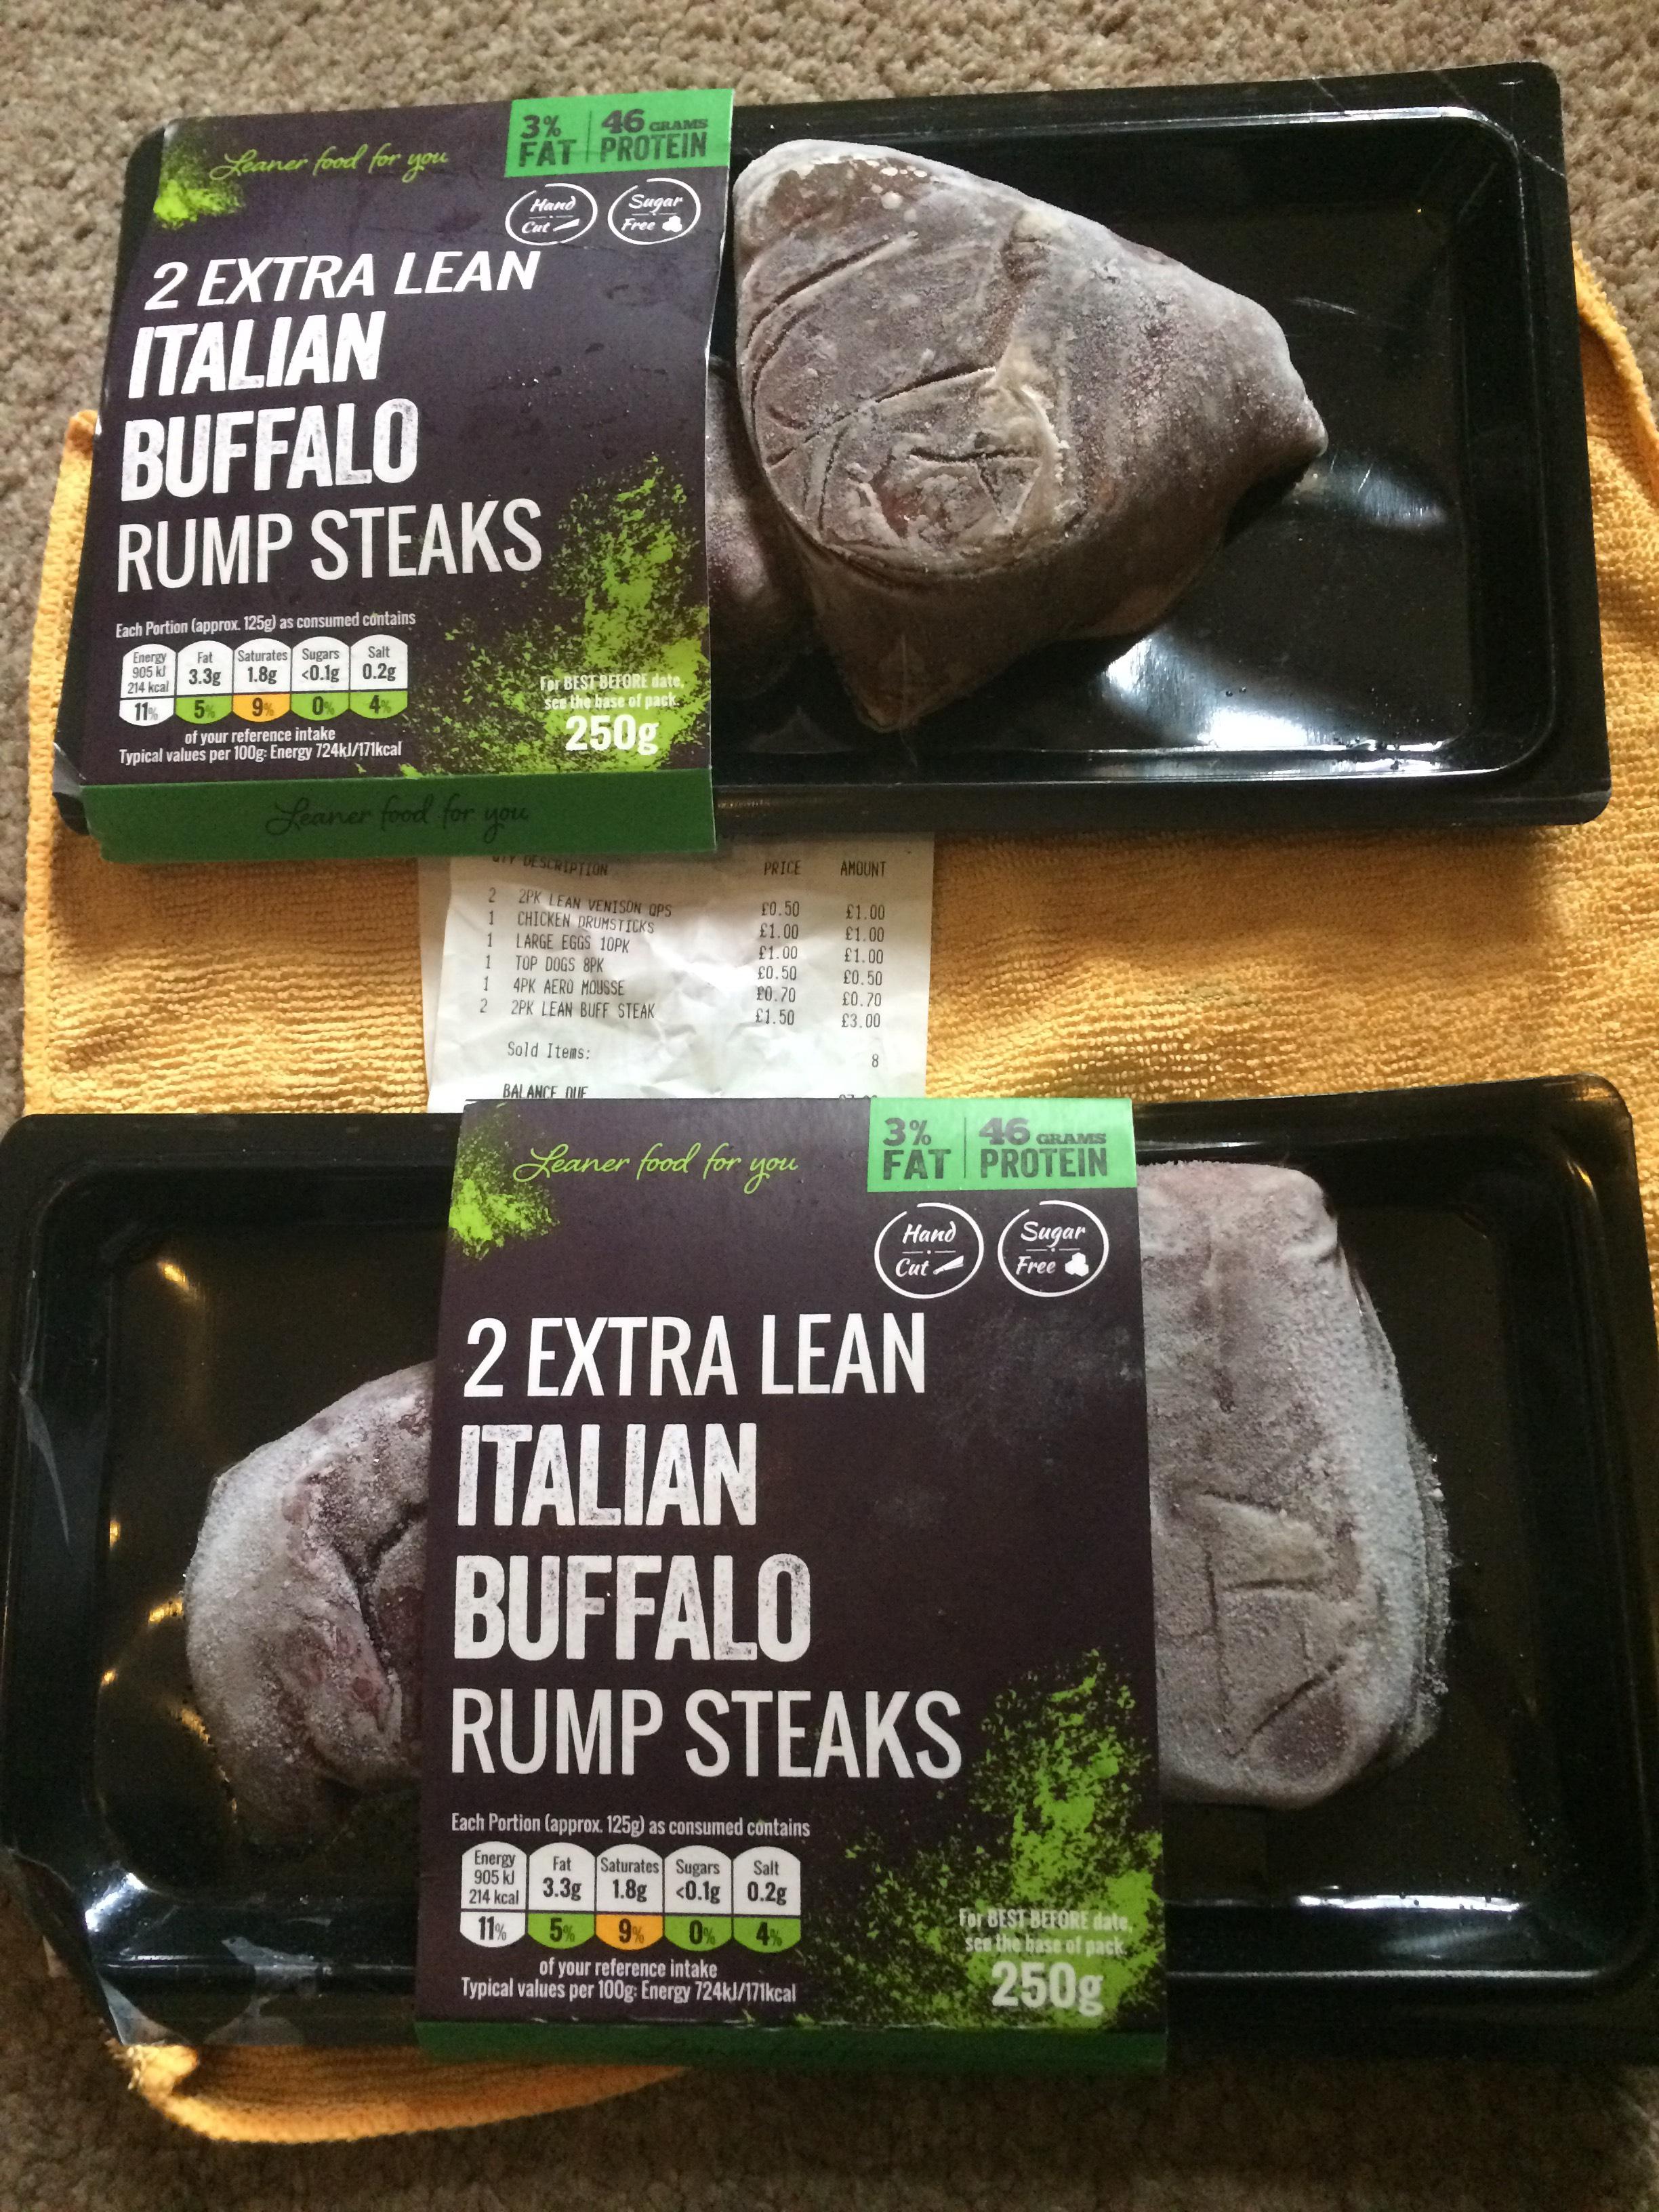 Italian Rump Buffalo steaks  down from £5 to £1.50 Iceland